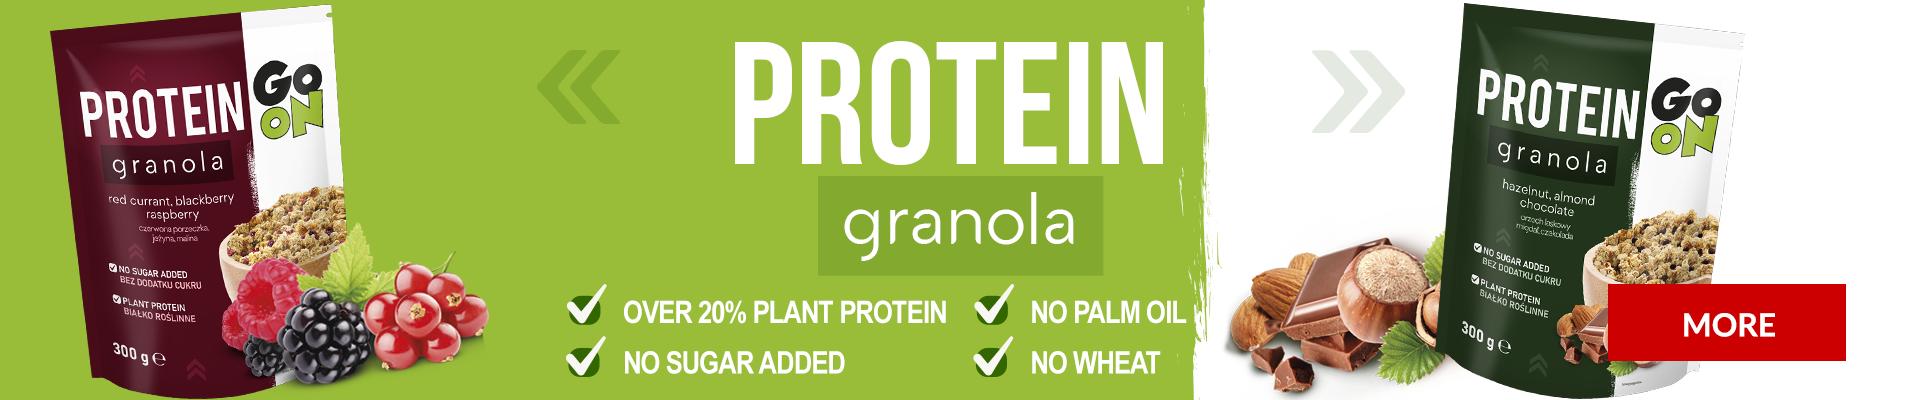 14520-1902440-ver3-EN-Banner-sklep-Granola-Protein-Nowosc-1920x400px